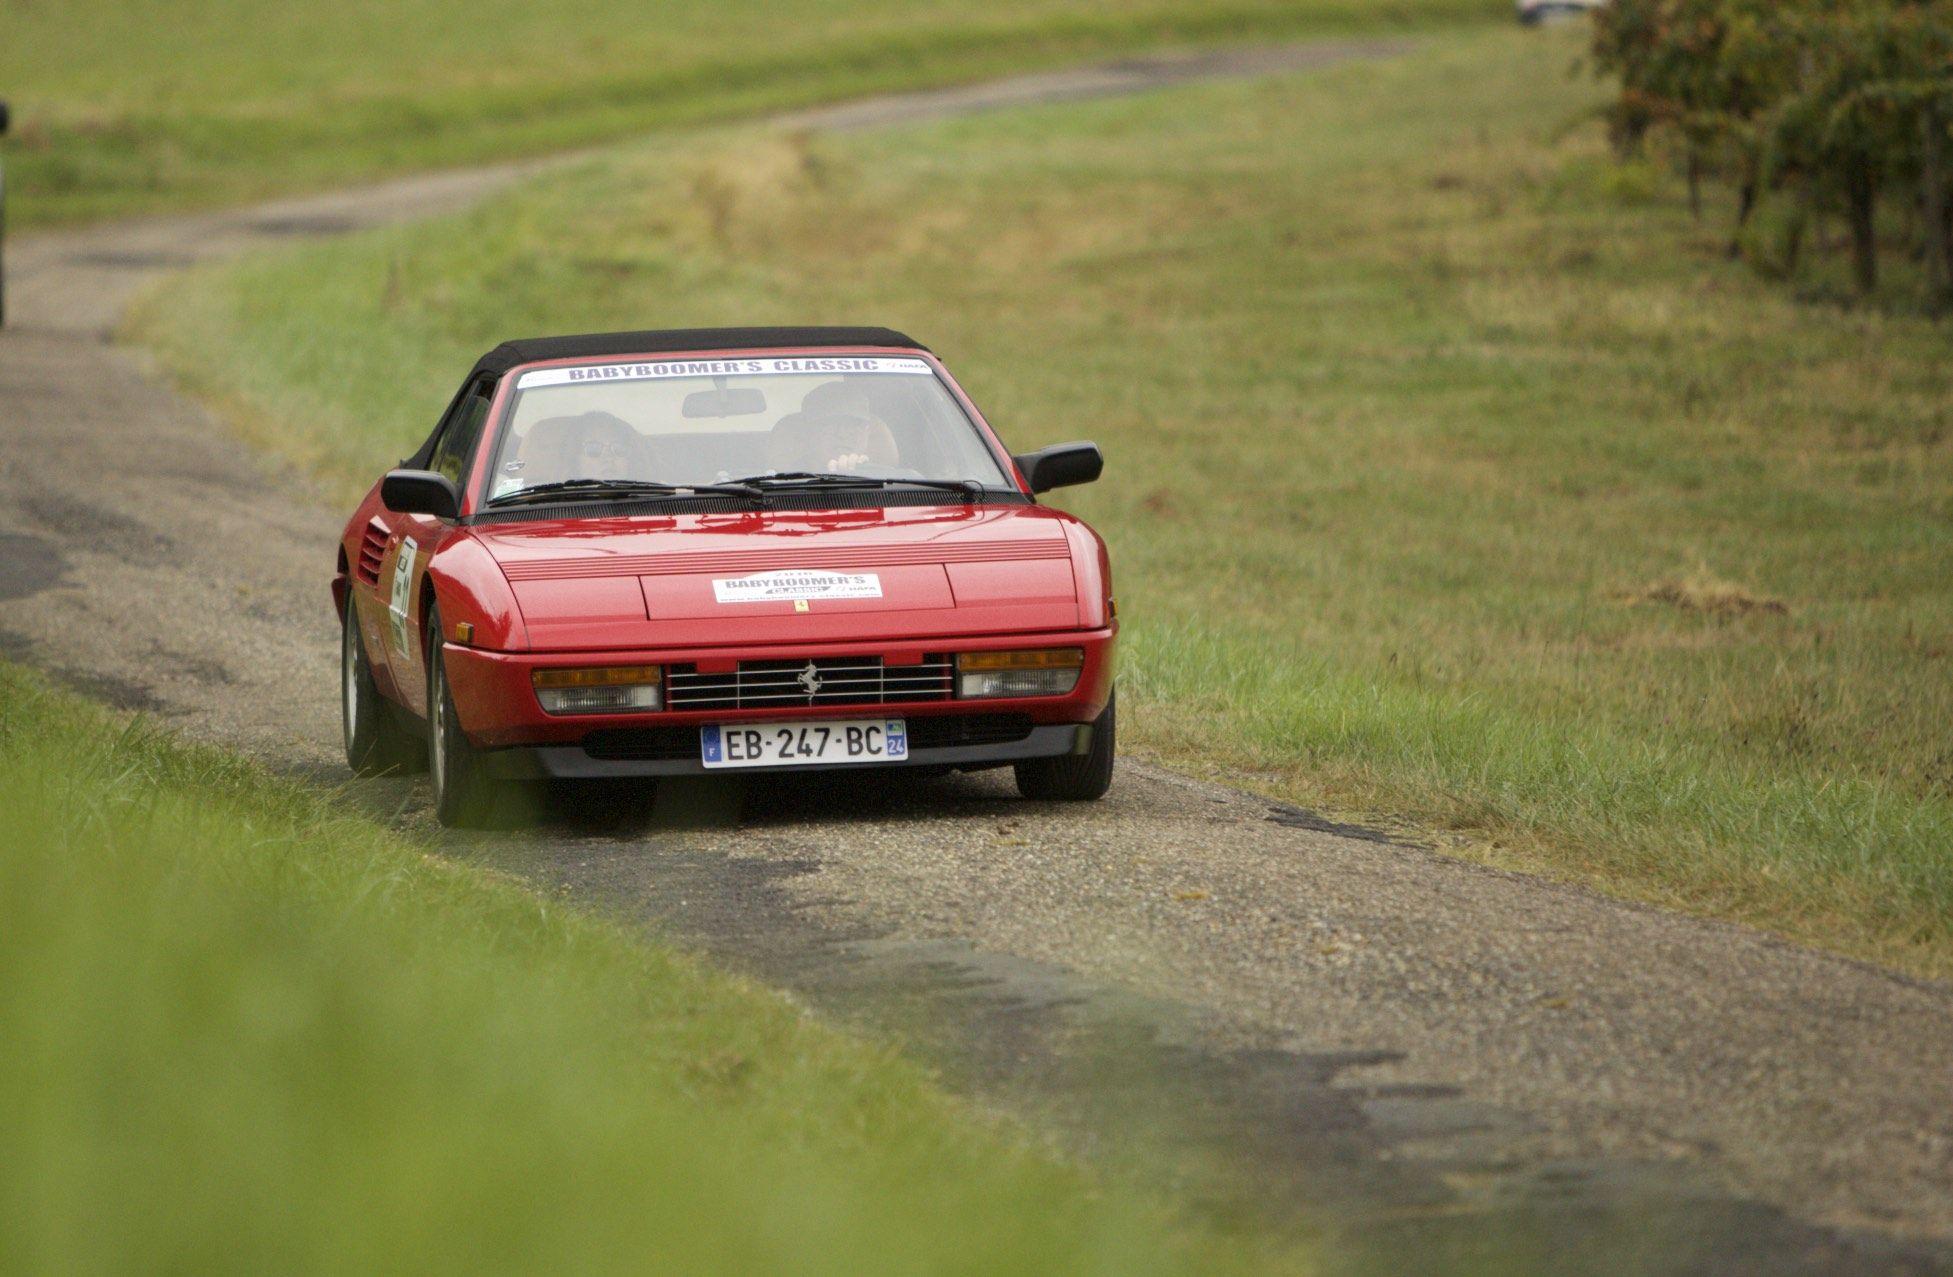 6f3110c955478f5e558939b63ca2a57b Fabulous Ferrari Mondial 8 Super Elite Cars Trend